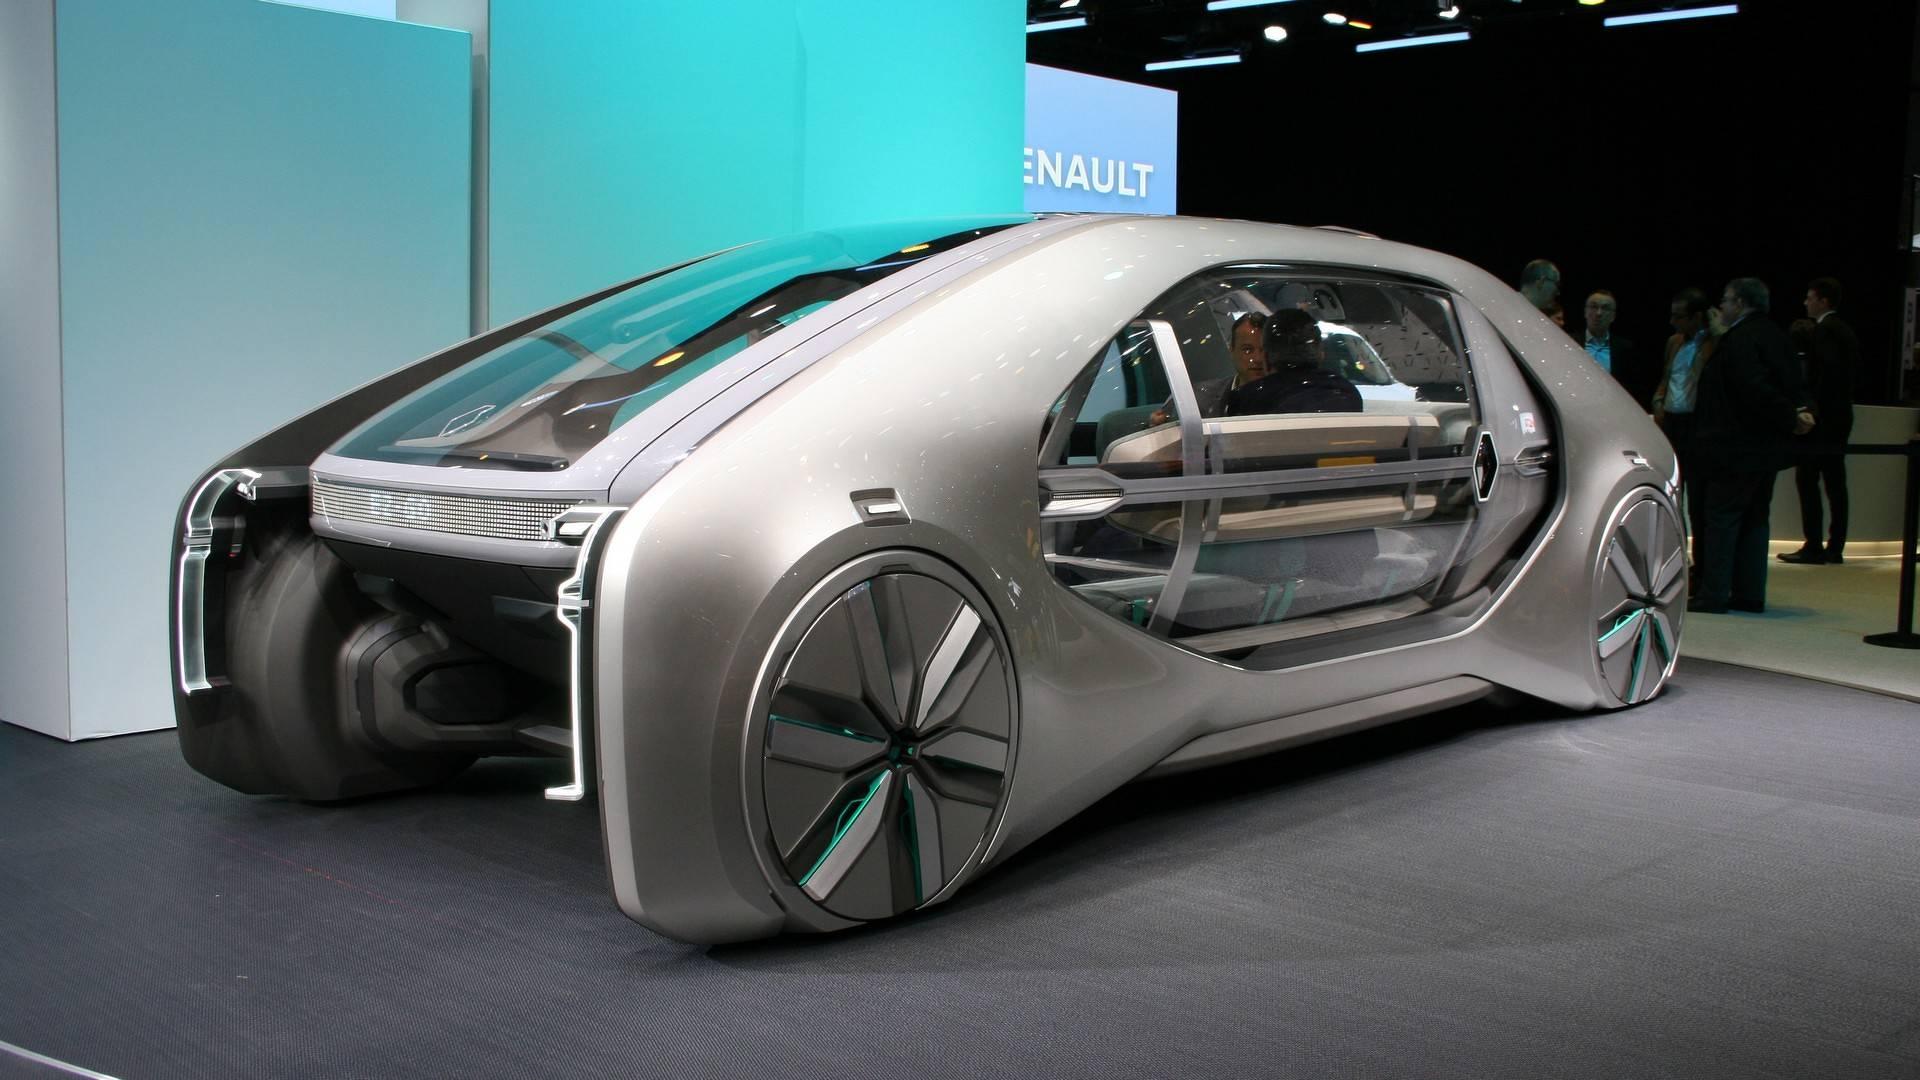 renault ez go concept رنو EZ GO مفهوم زنده از نمایشگاه ژنو رونمایی شد   اجاره ماشین